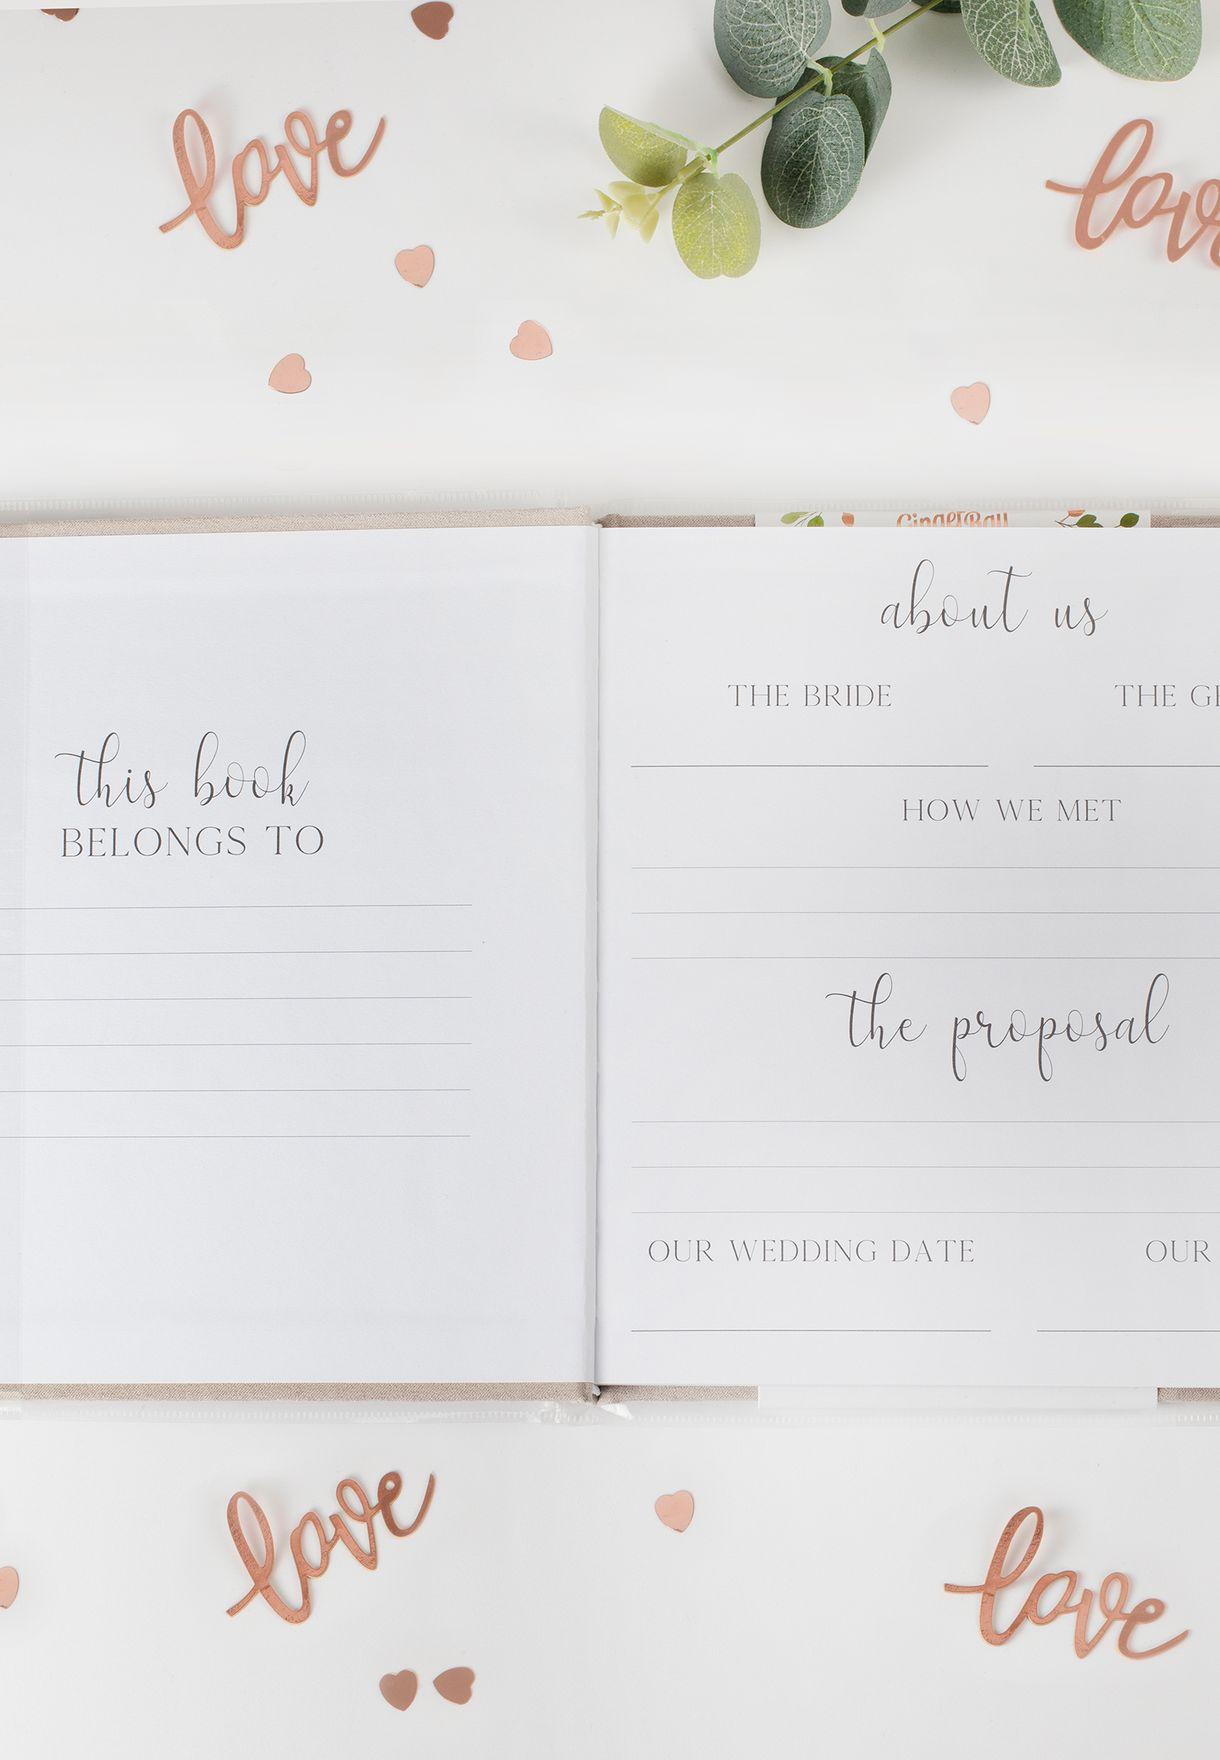 دفتر تخطيط حفلات الزفاف